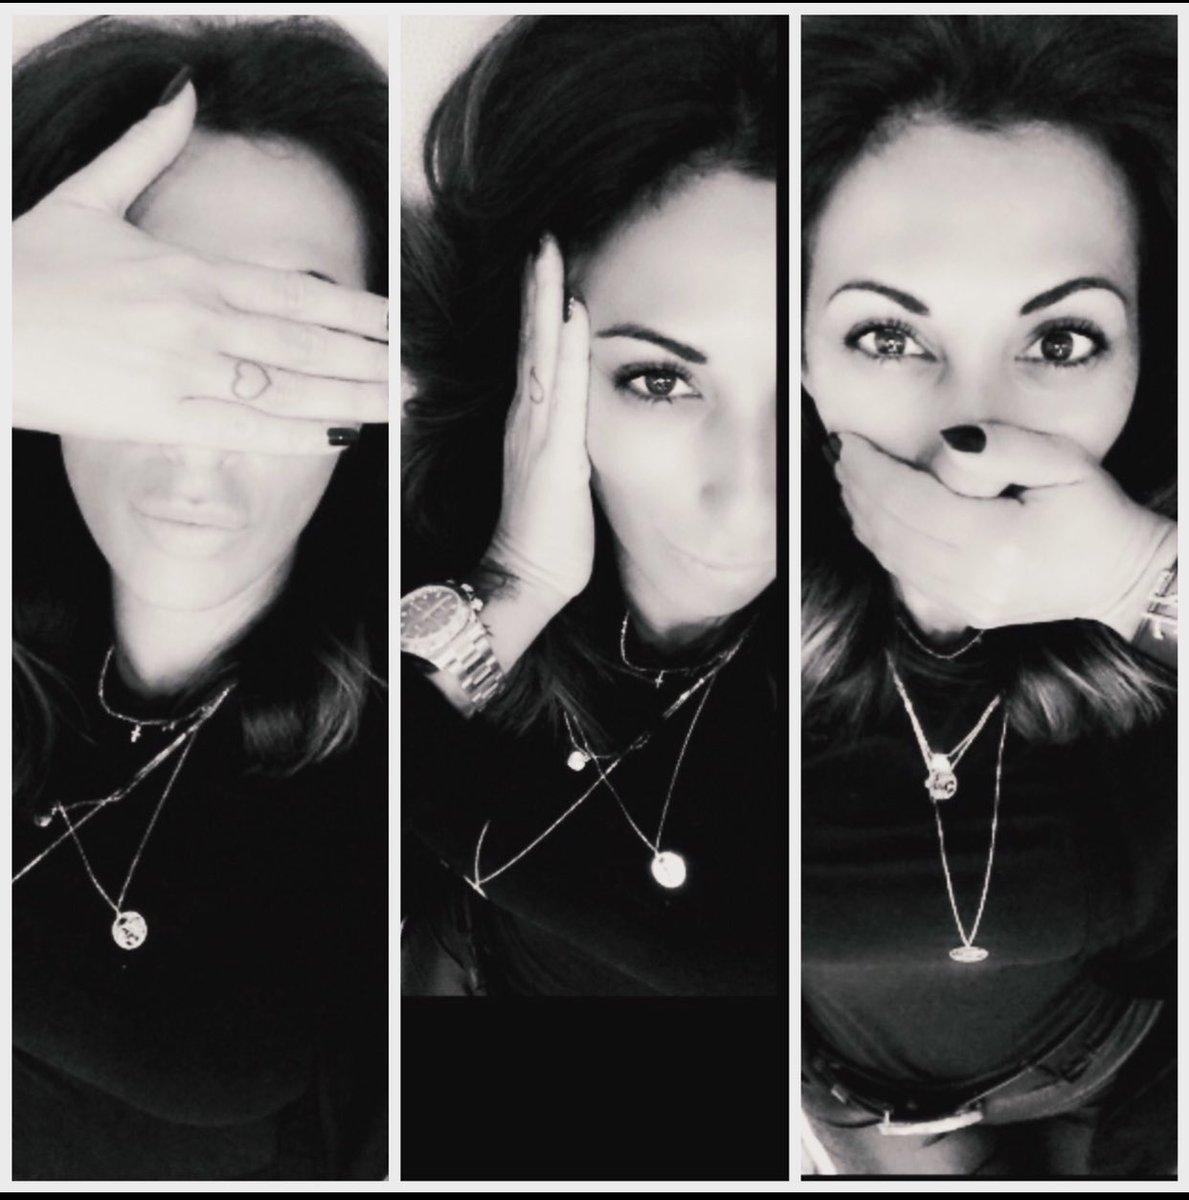 Chi non comprende il tuo silenzio probabilmente non capirà nemmeno le tue parole! #photography #photo #photoshoot #Amici20 #friends #Daydreamer #CanYaman #DemetOzdemir #Netflix #travelphotography #WorkFromHome #Miami #TwitchStreamers #DoğduğunEvKaderindir #YouMakeStrayKidsStay